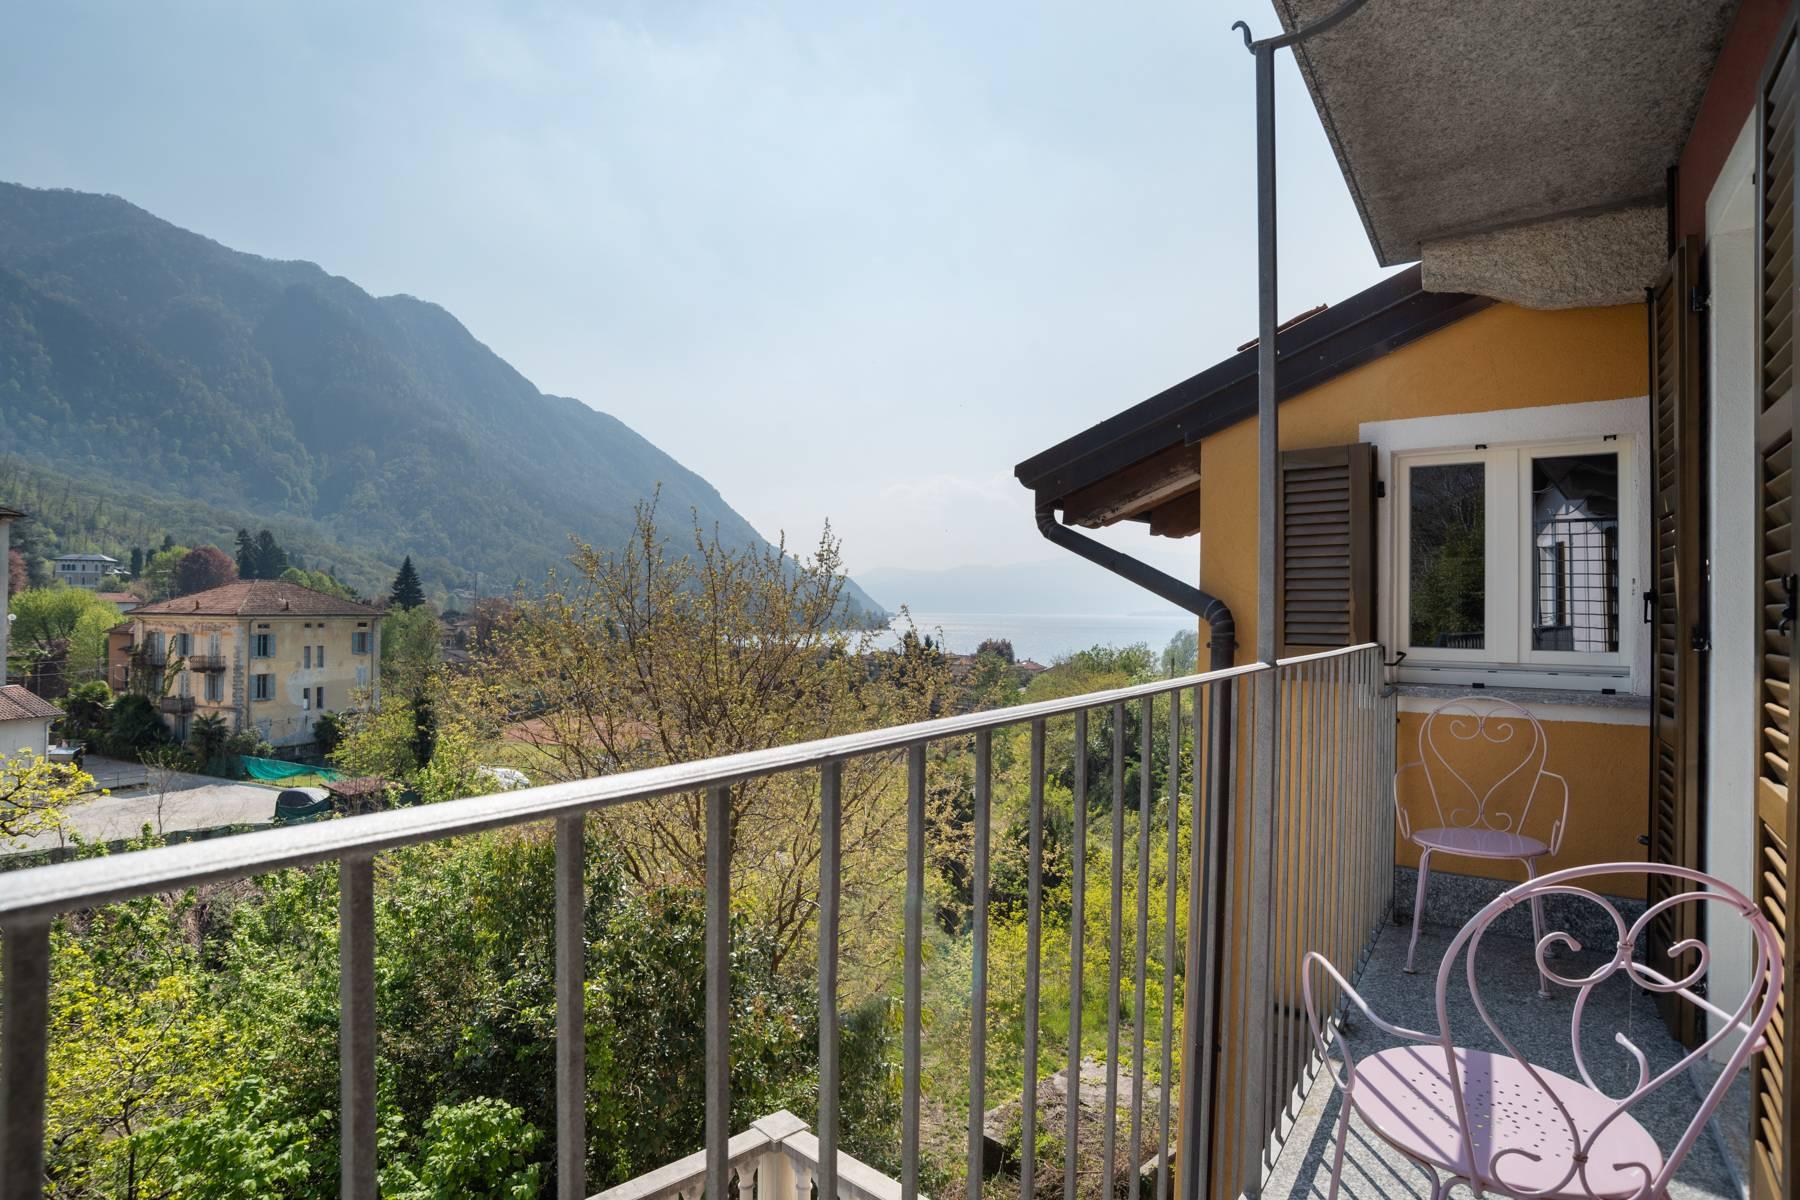 Appartamento in Vendita a Castelveccana via giuseppe mazzini